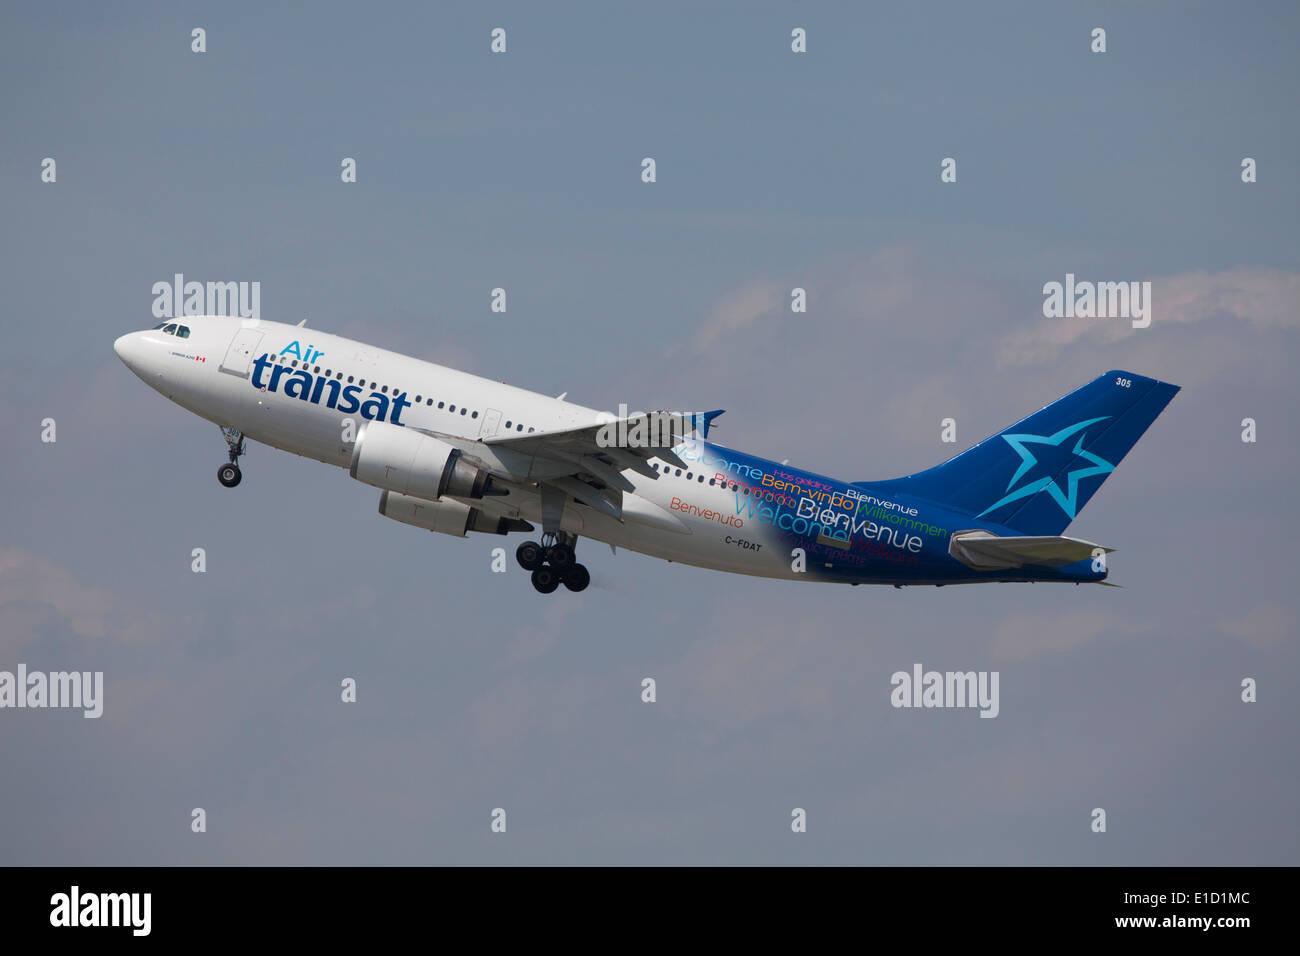 Airbus A310 300 Stockfotos Airbus A310 300 Bilder Alamy